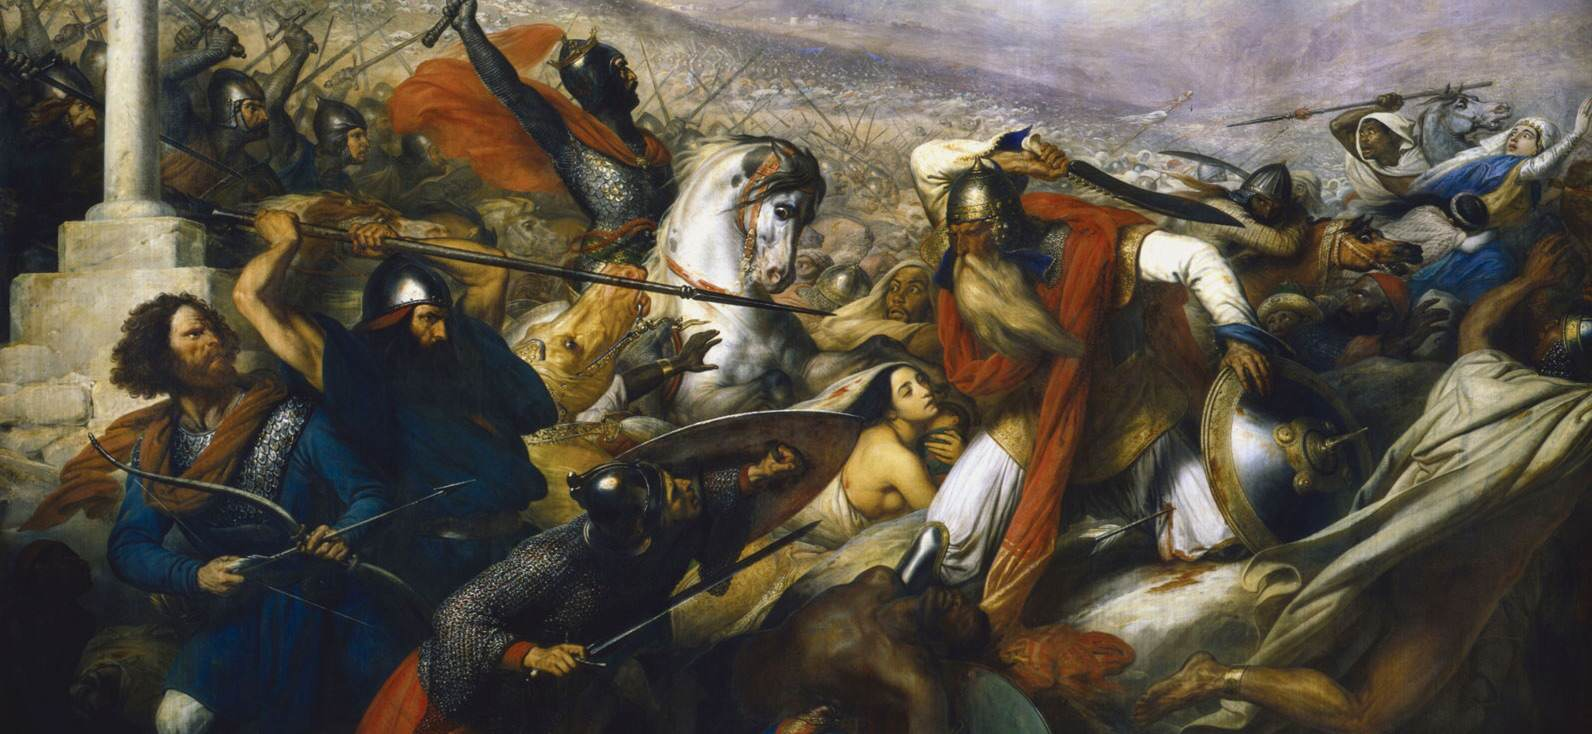 Charles de Steuben - Slaget vid Poitiers 732 (Wikipedia)